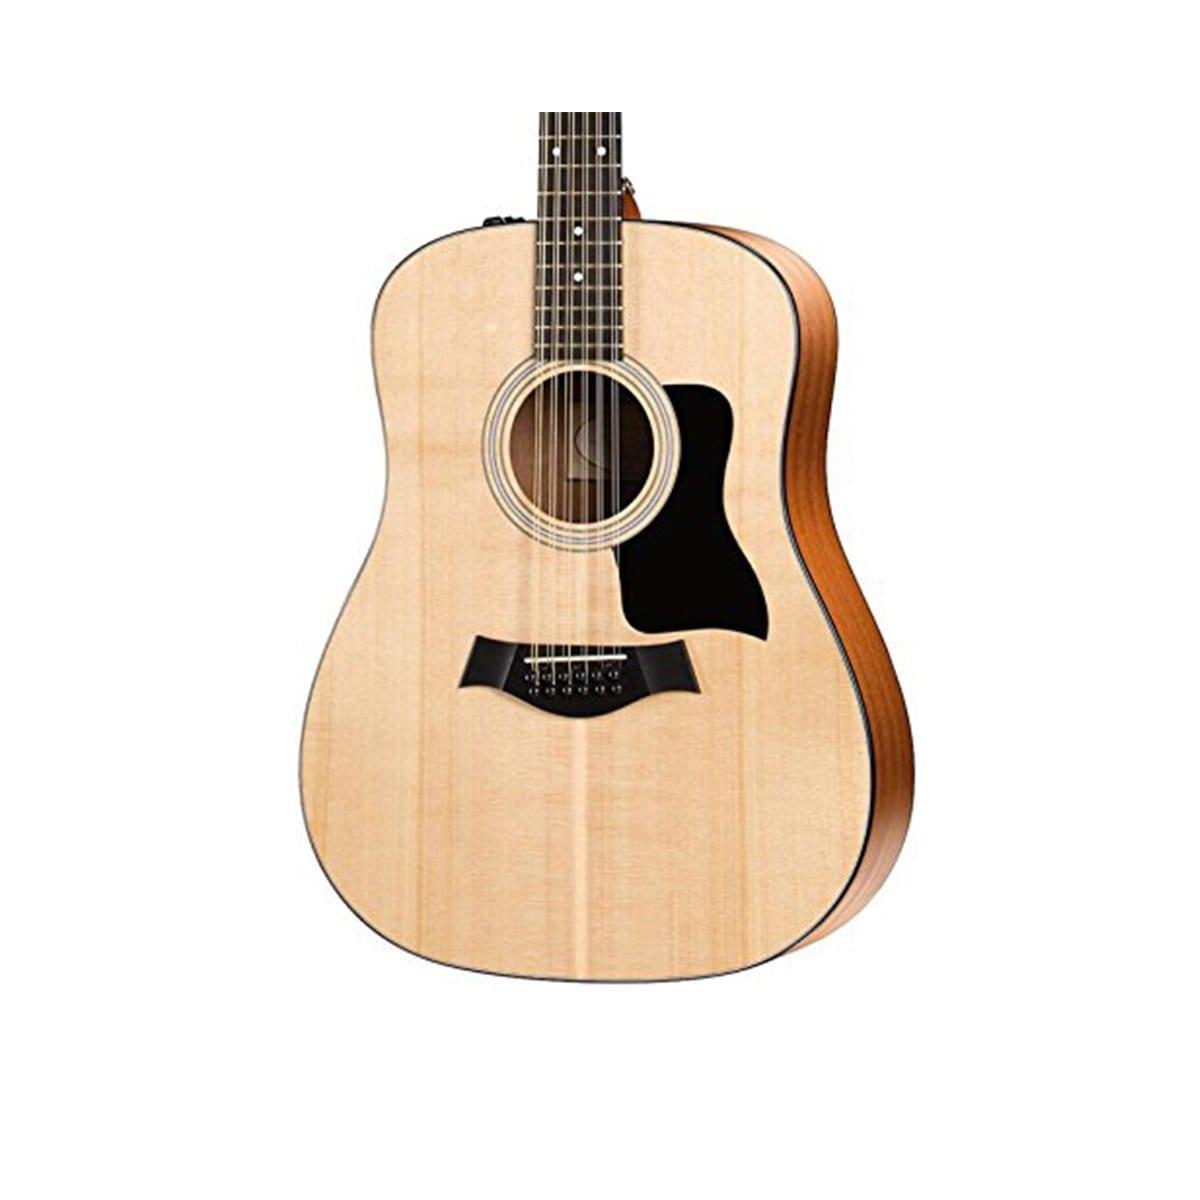 Taylor 150E 12-string Acoustic Guitar